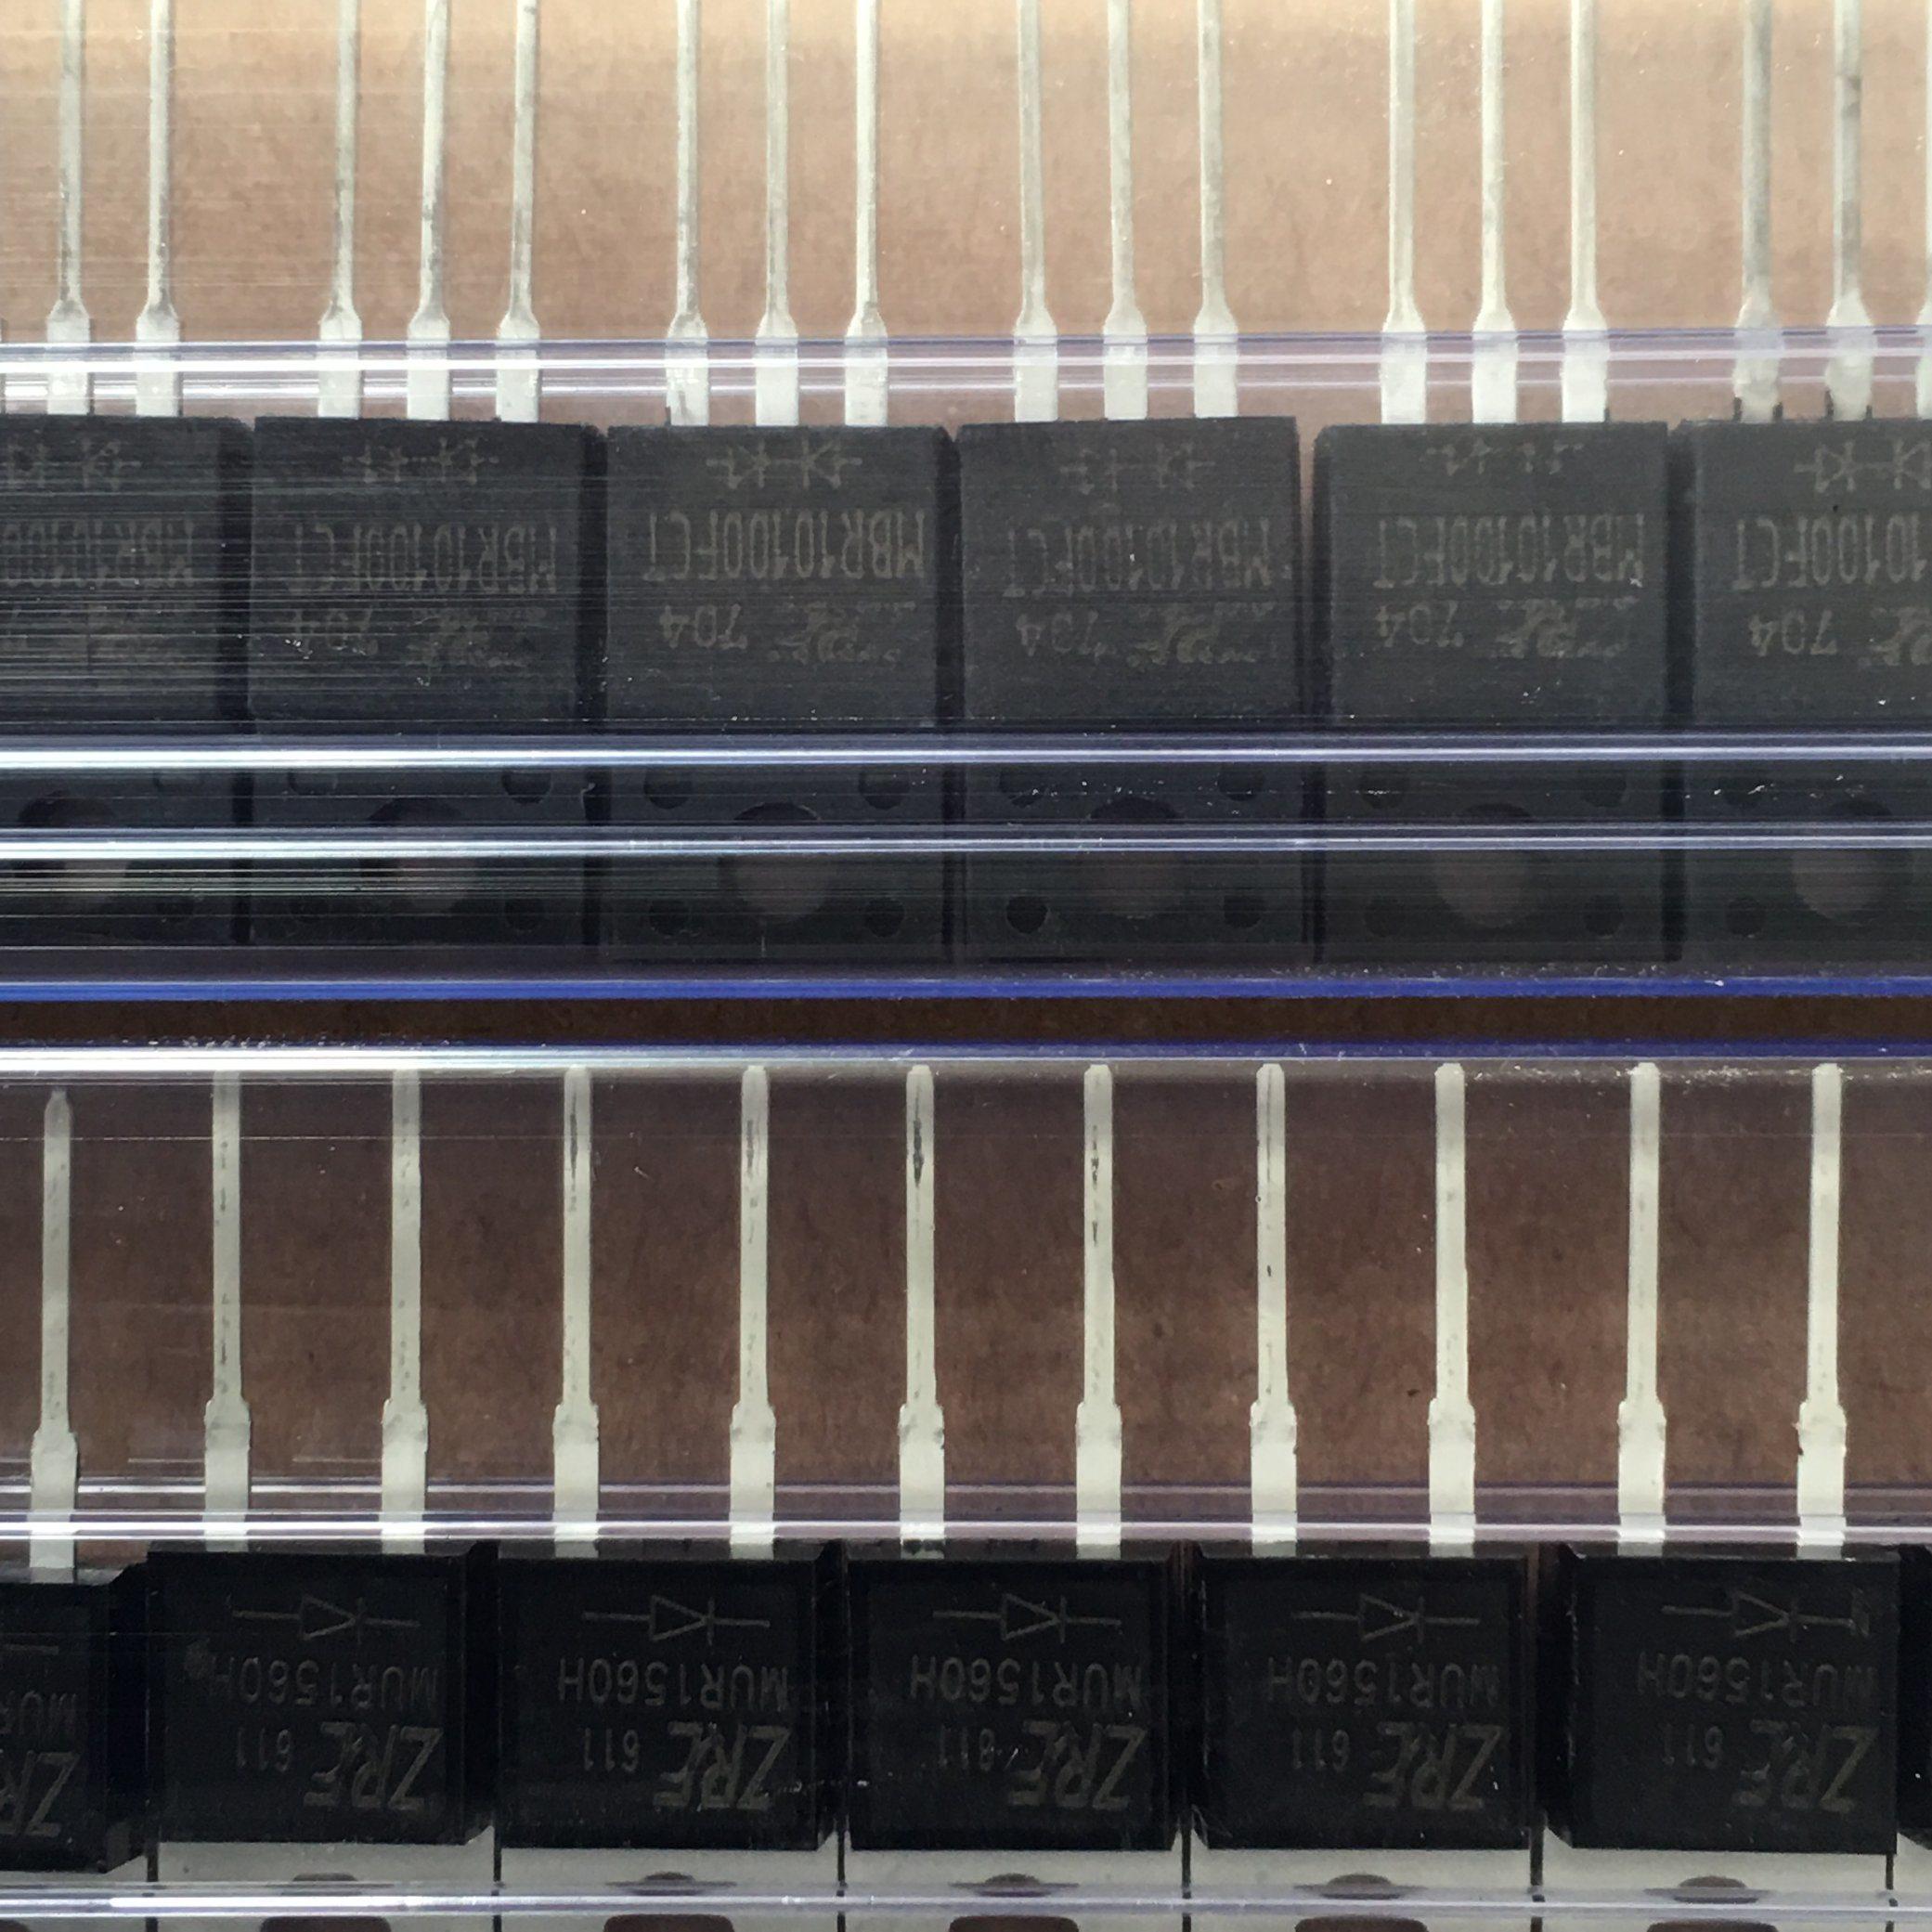 8A Sr840 (F) Thru Sr8200 (F) Schottky Barrier Rectifiers ITO-220AC